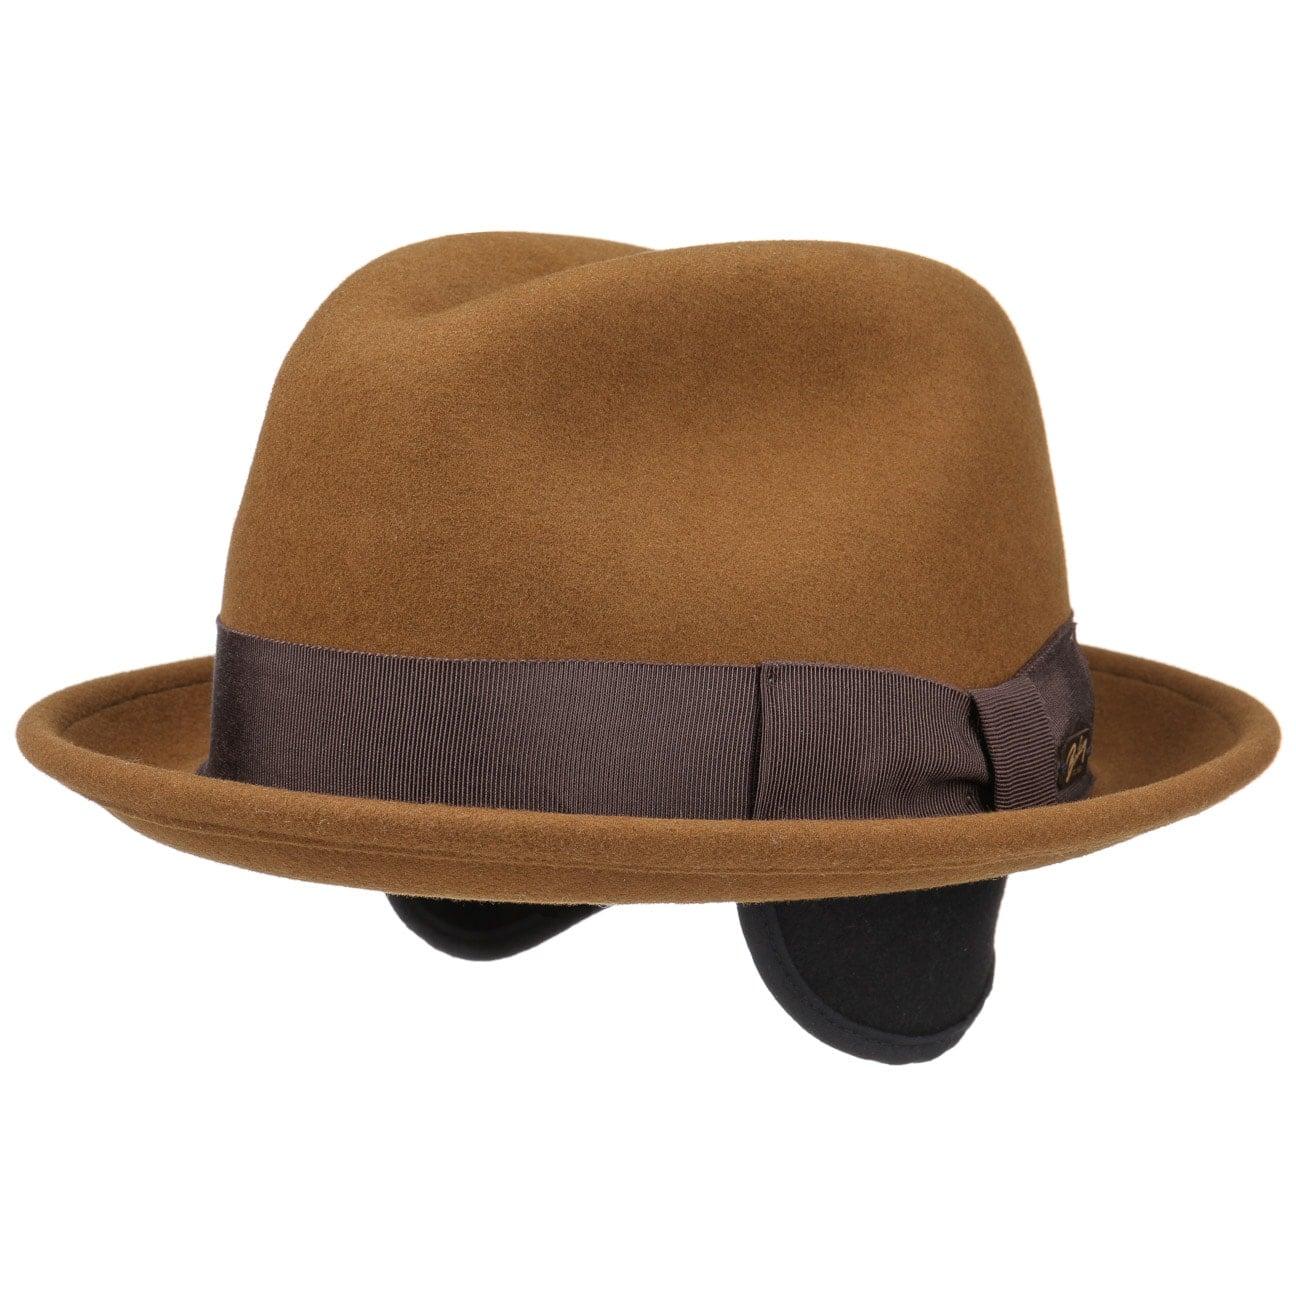 Sombrero Craven Litefelt by Bailey of Hollywood  sombrero de hombre